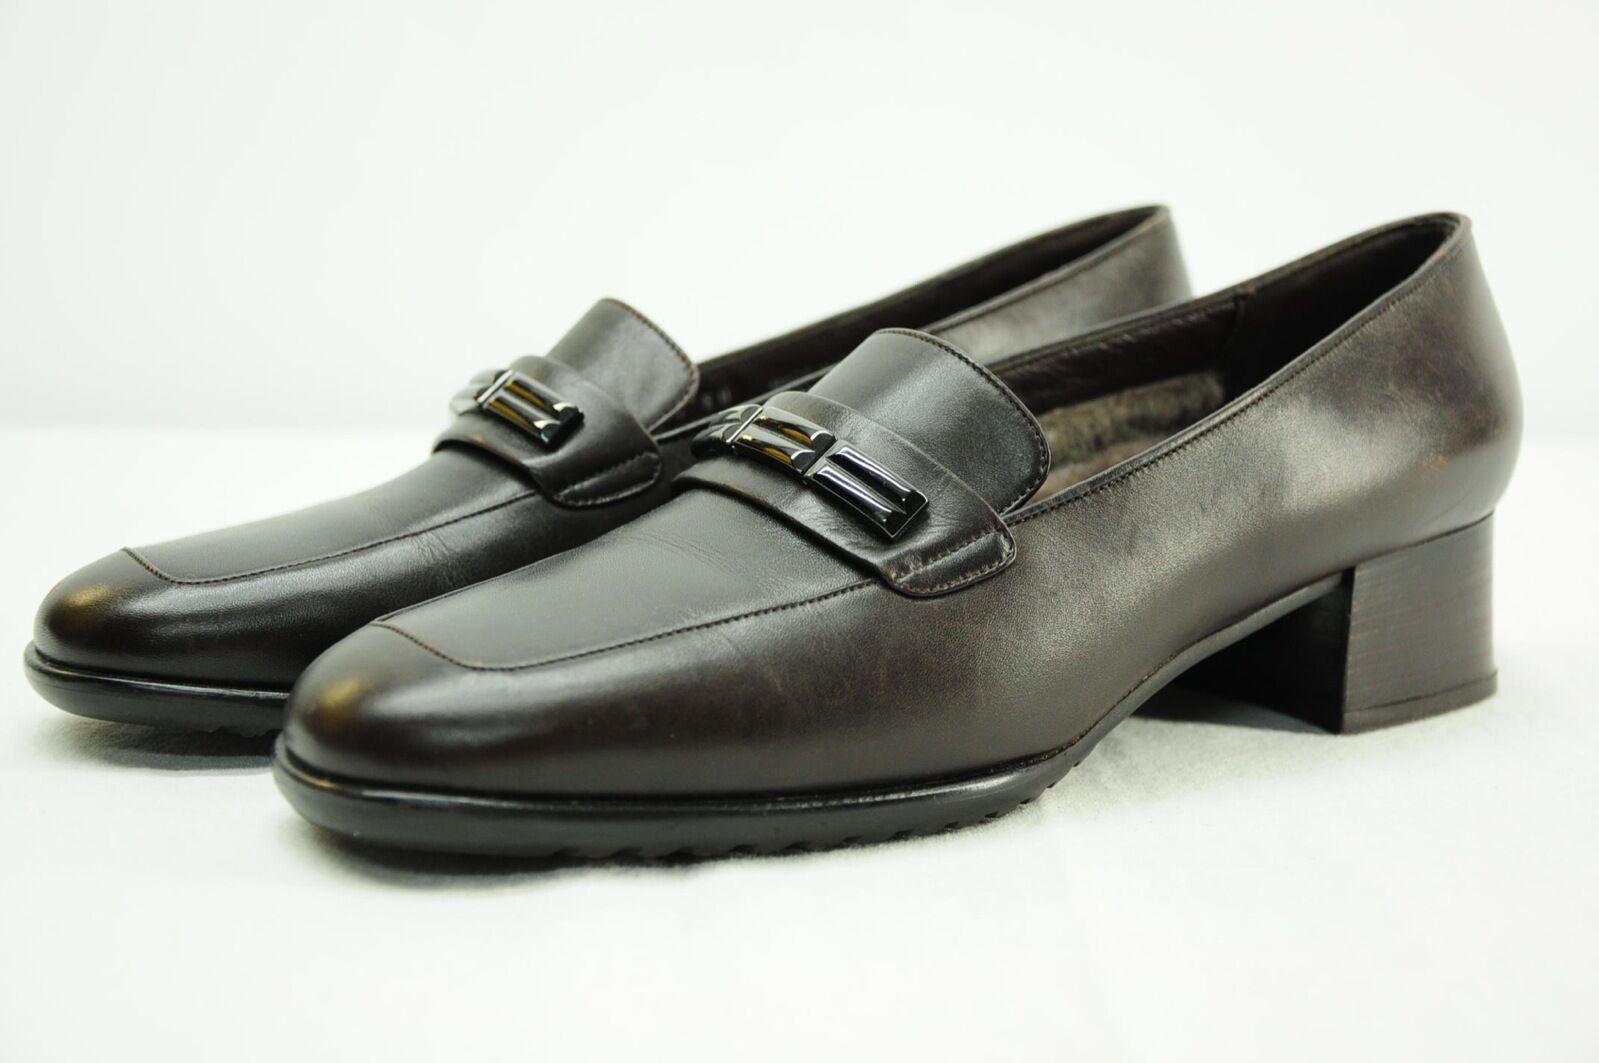 NWOT Bally Shearling Lined Braun Leder Buckle Loafer Heels Made in  7